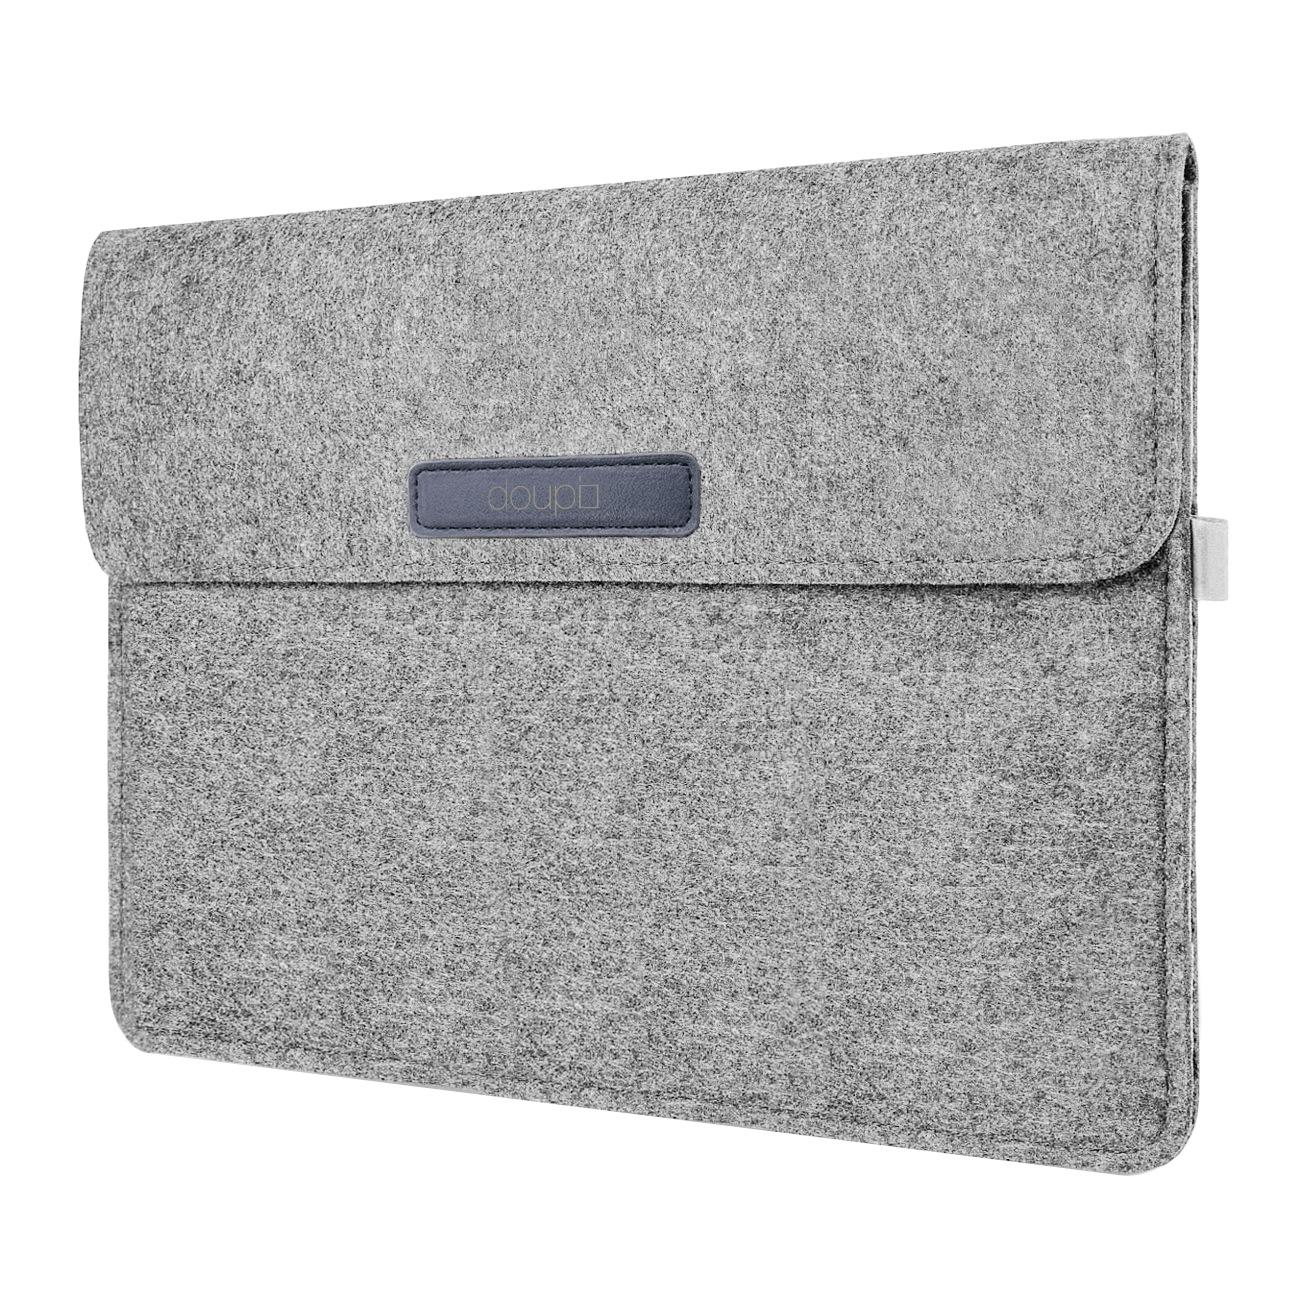 bluetooth tastatur ipad pro 12 9 drahtlos smart keyboard englisch en uk tasche ebay. Black Bedroom Furniture Sets. Home Design Ideas